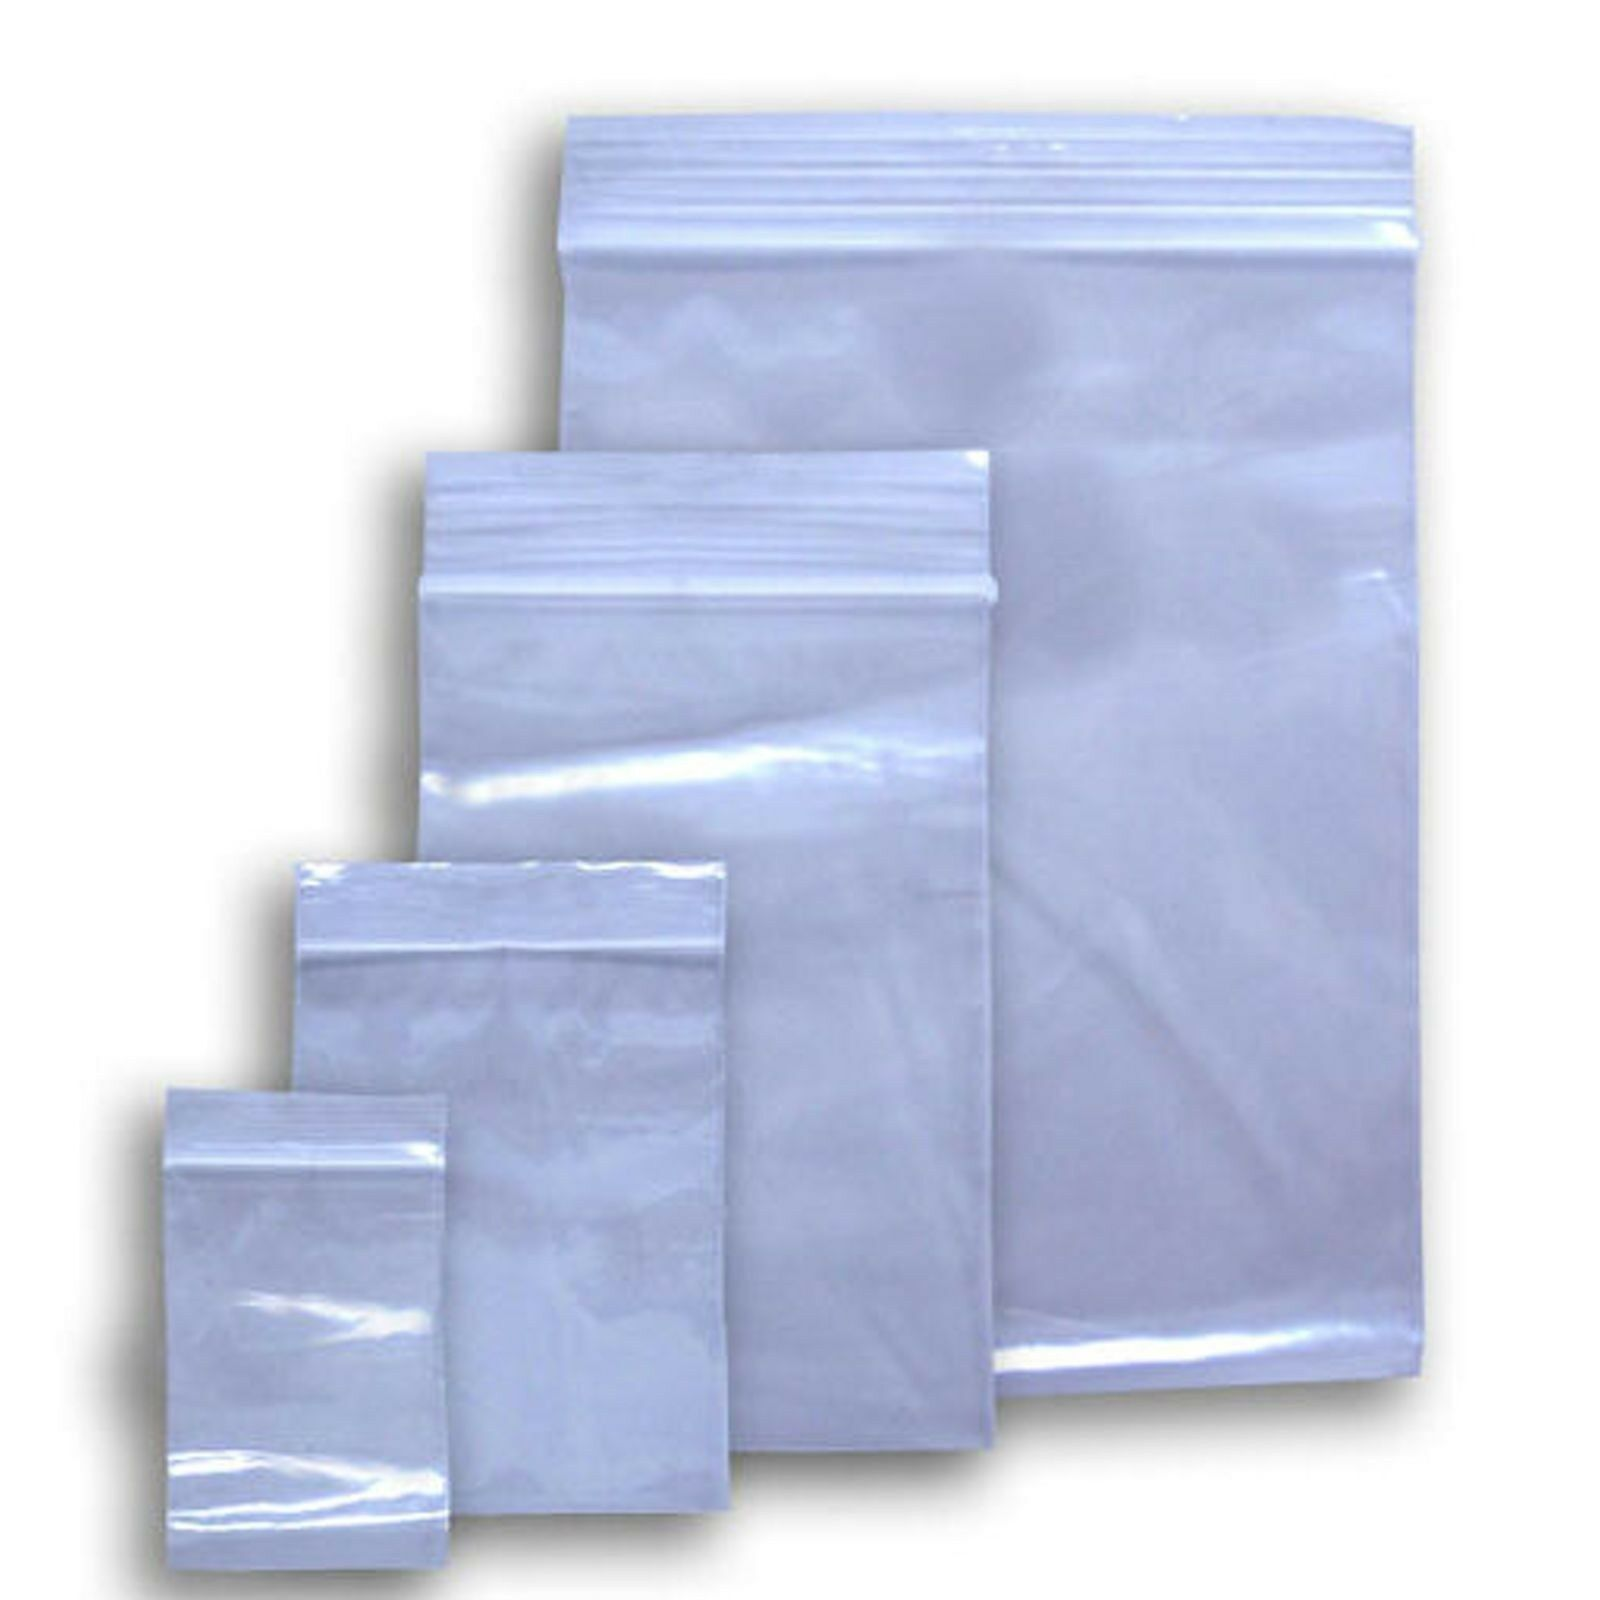 "Reclosable Poly Bag - 4"" x 4"" - 4 mil"